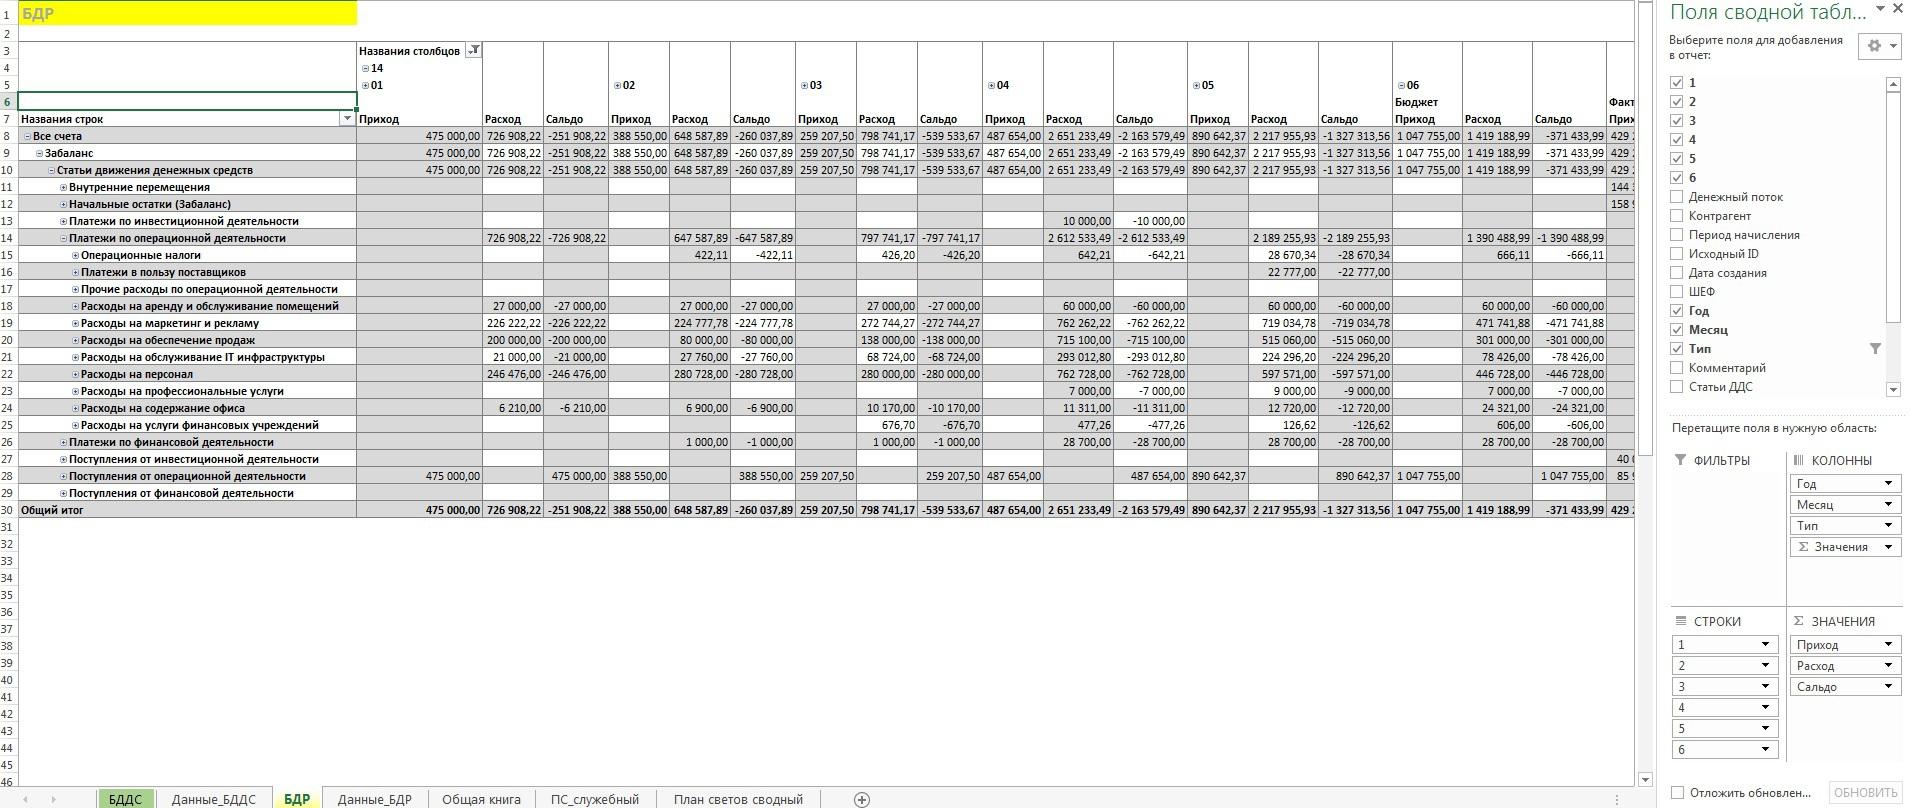 Отчет об исполнении бюджета - Администрация Брюховецкого 58